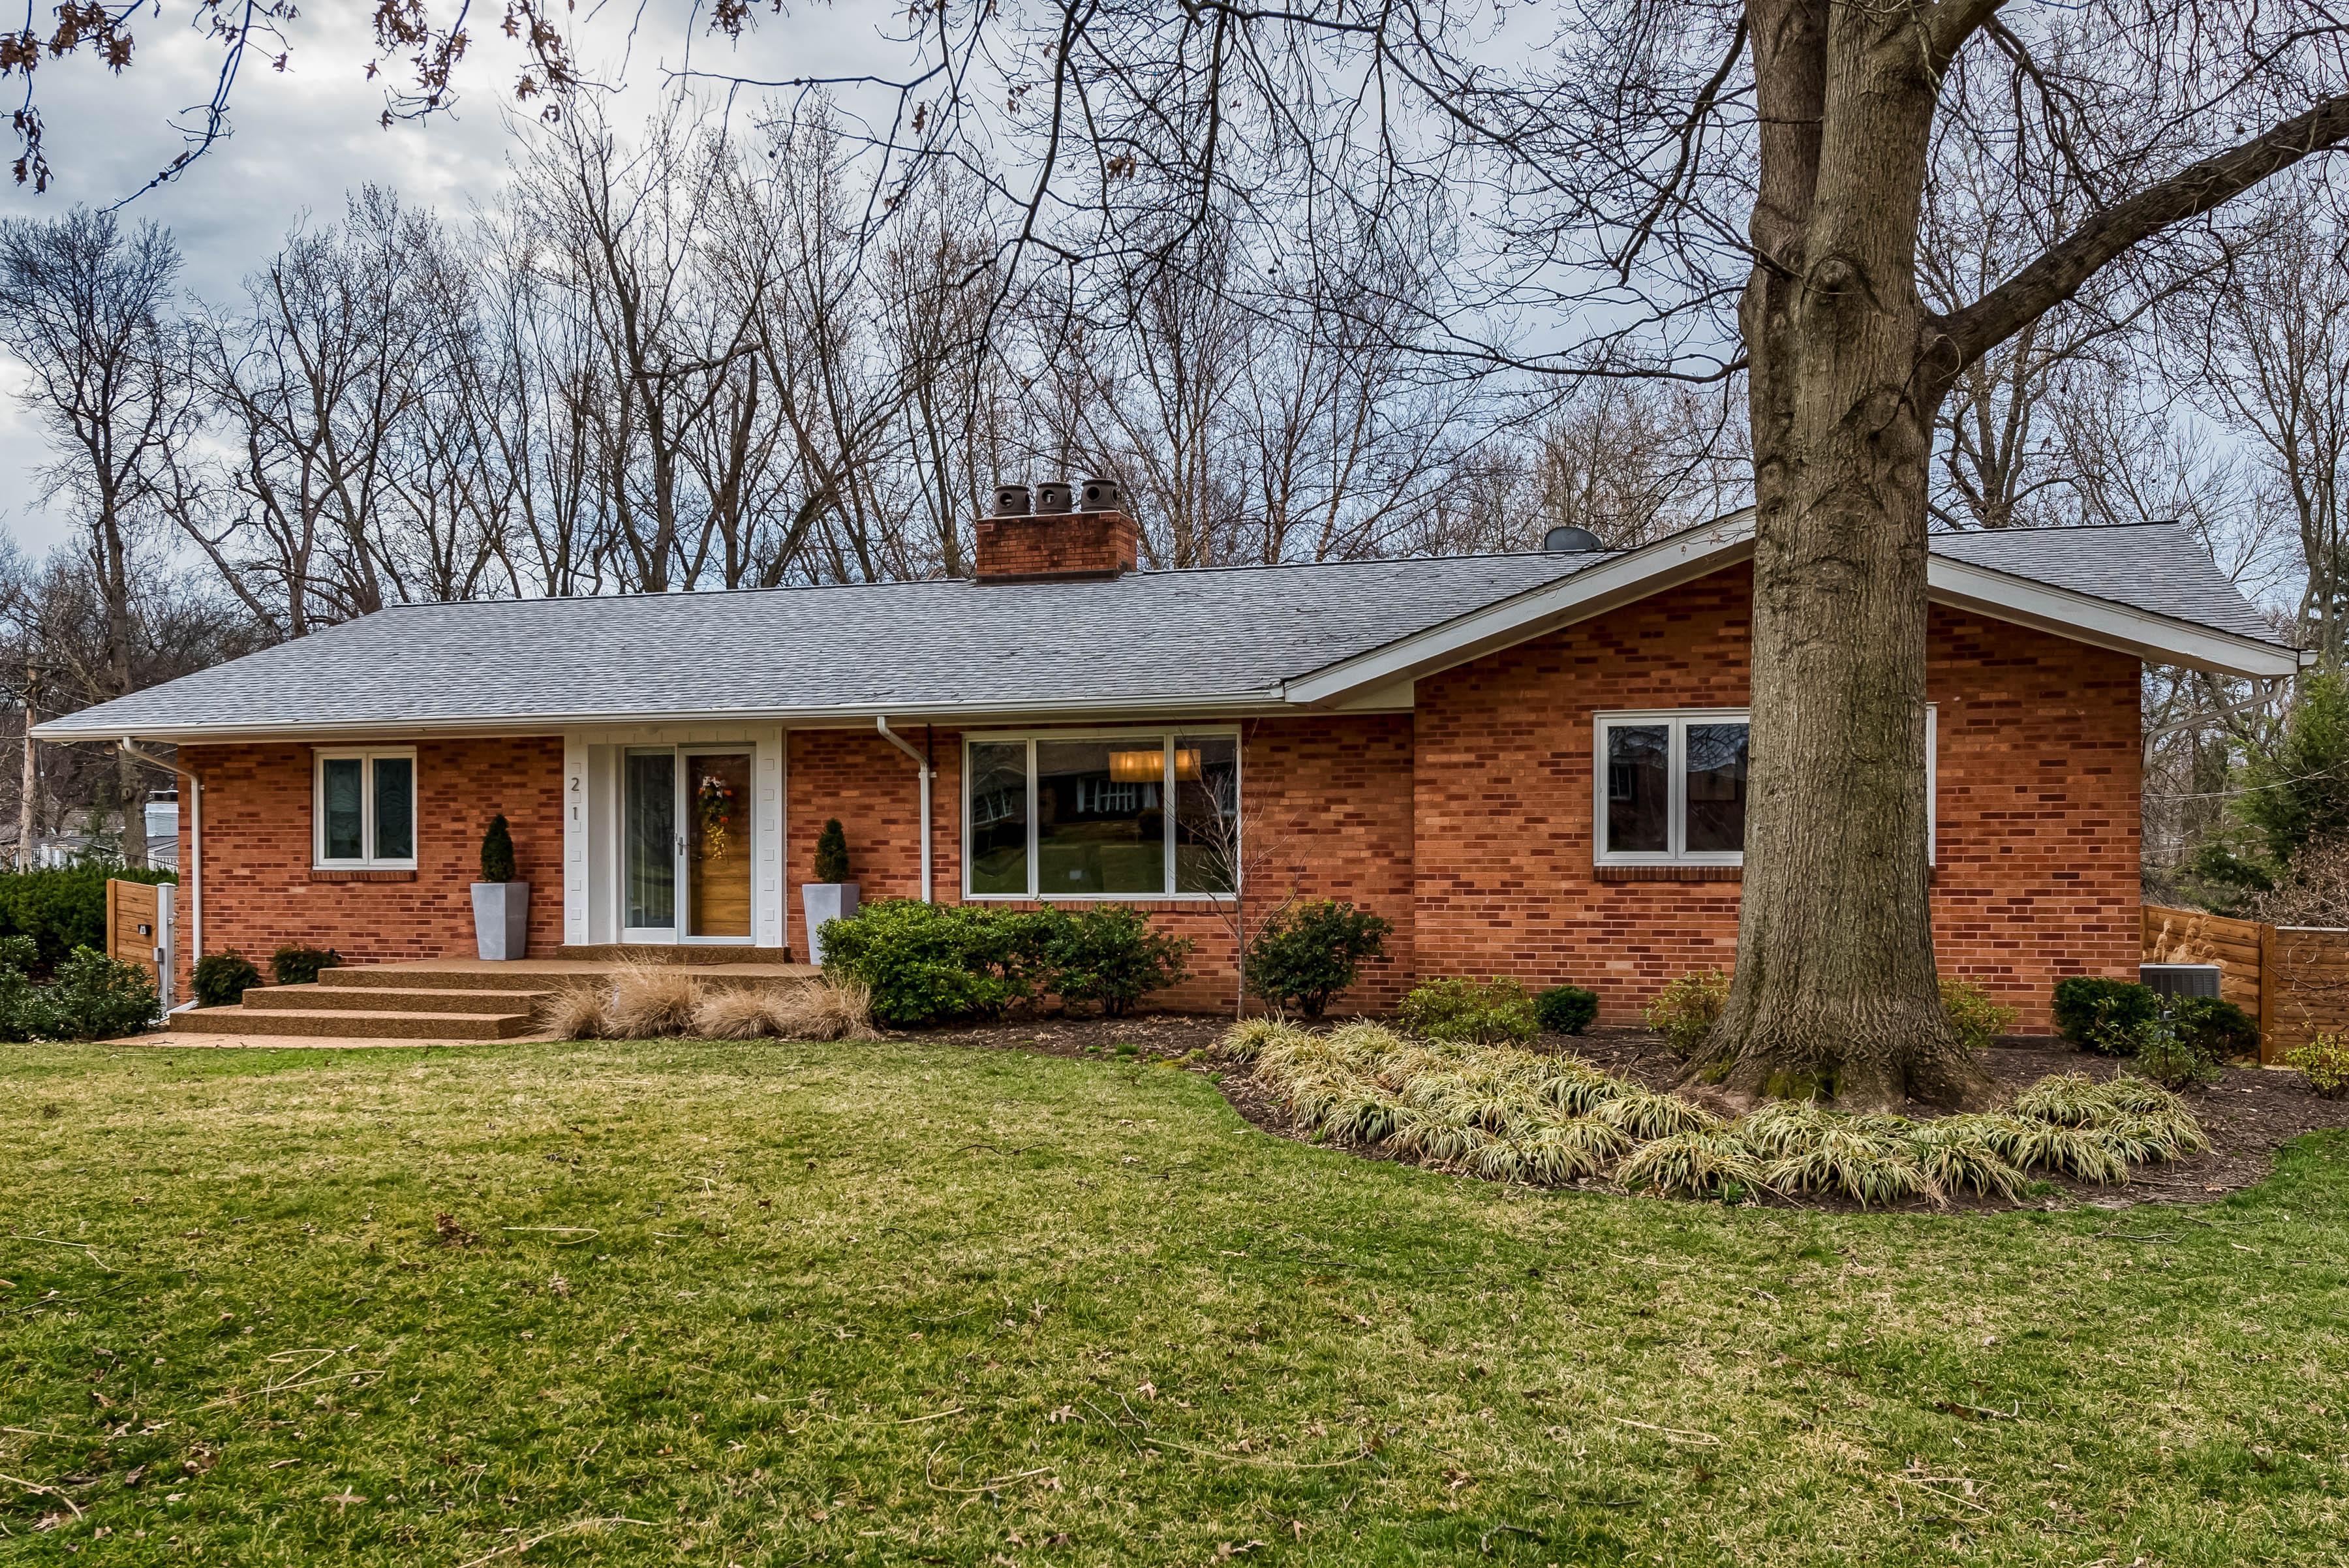 Single Family Home for Sale at Ladue Ridge 21 Ladue Ridge St. Louis, Missouri, 63124 United States